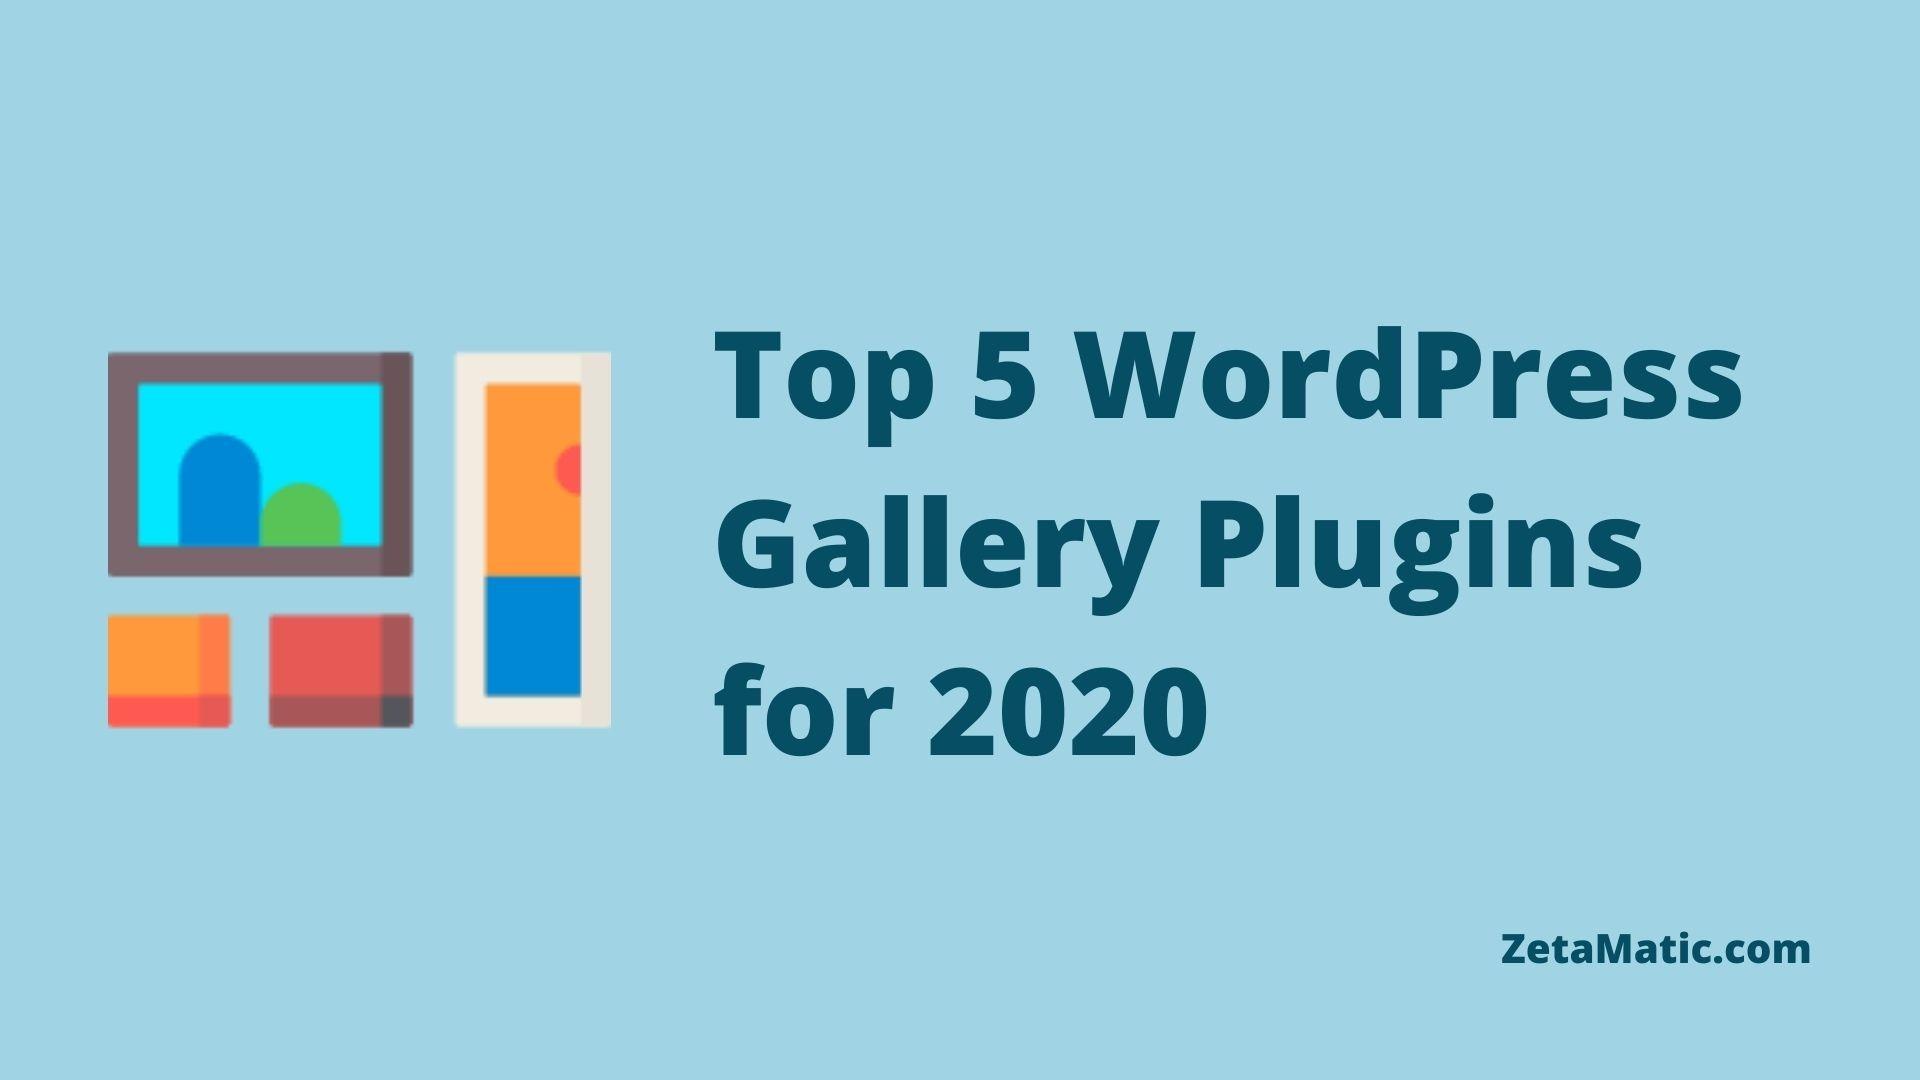 Top 5 WordPress Gallery Plugins for 2020